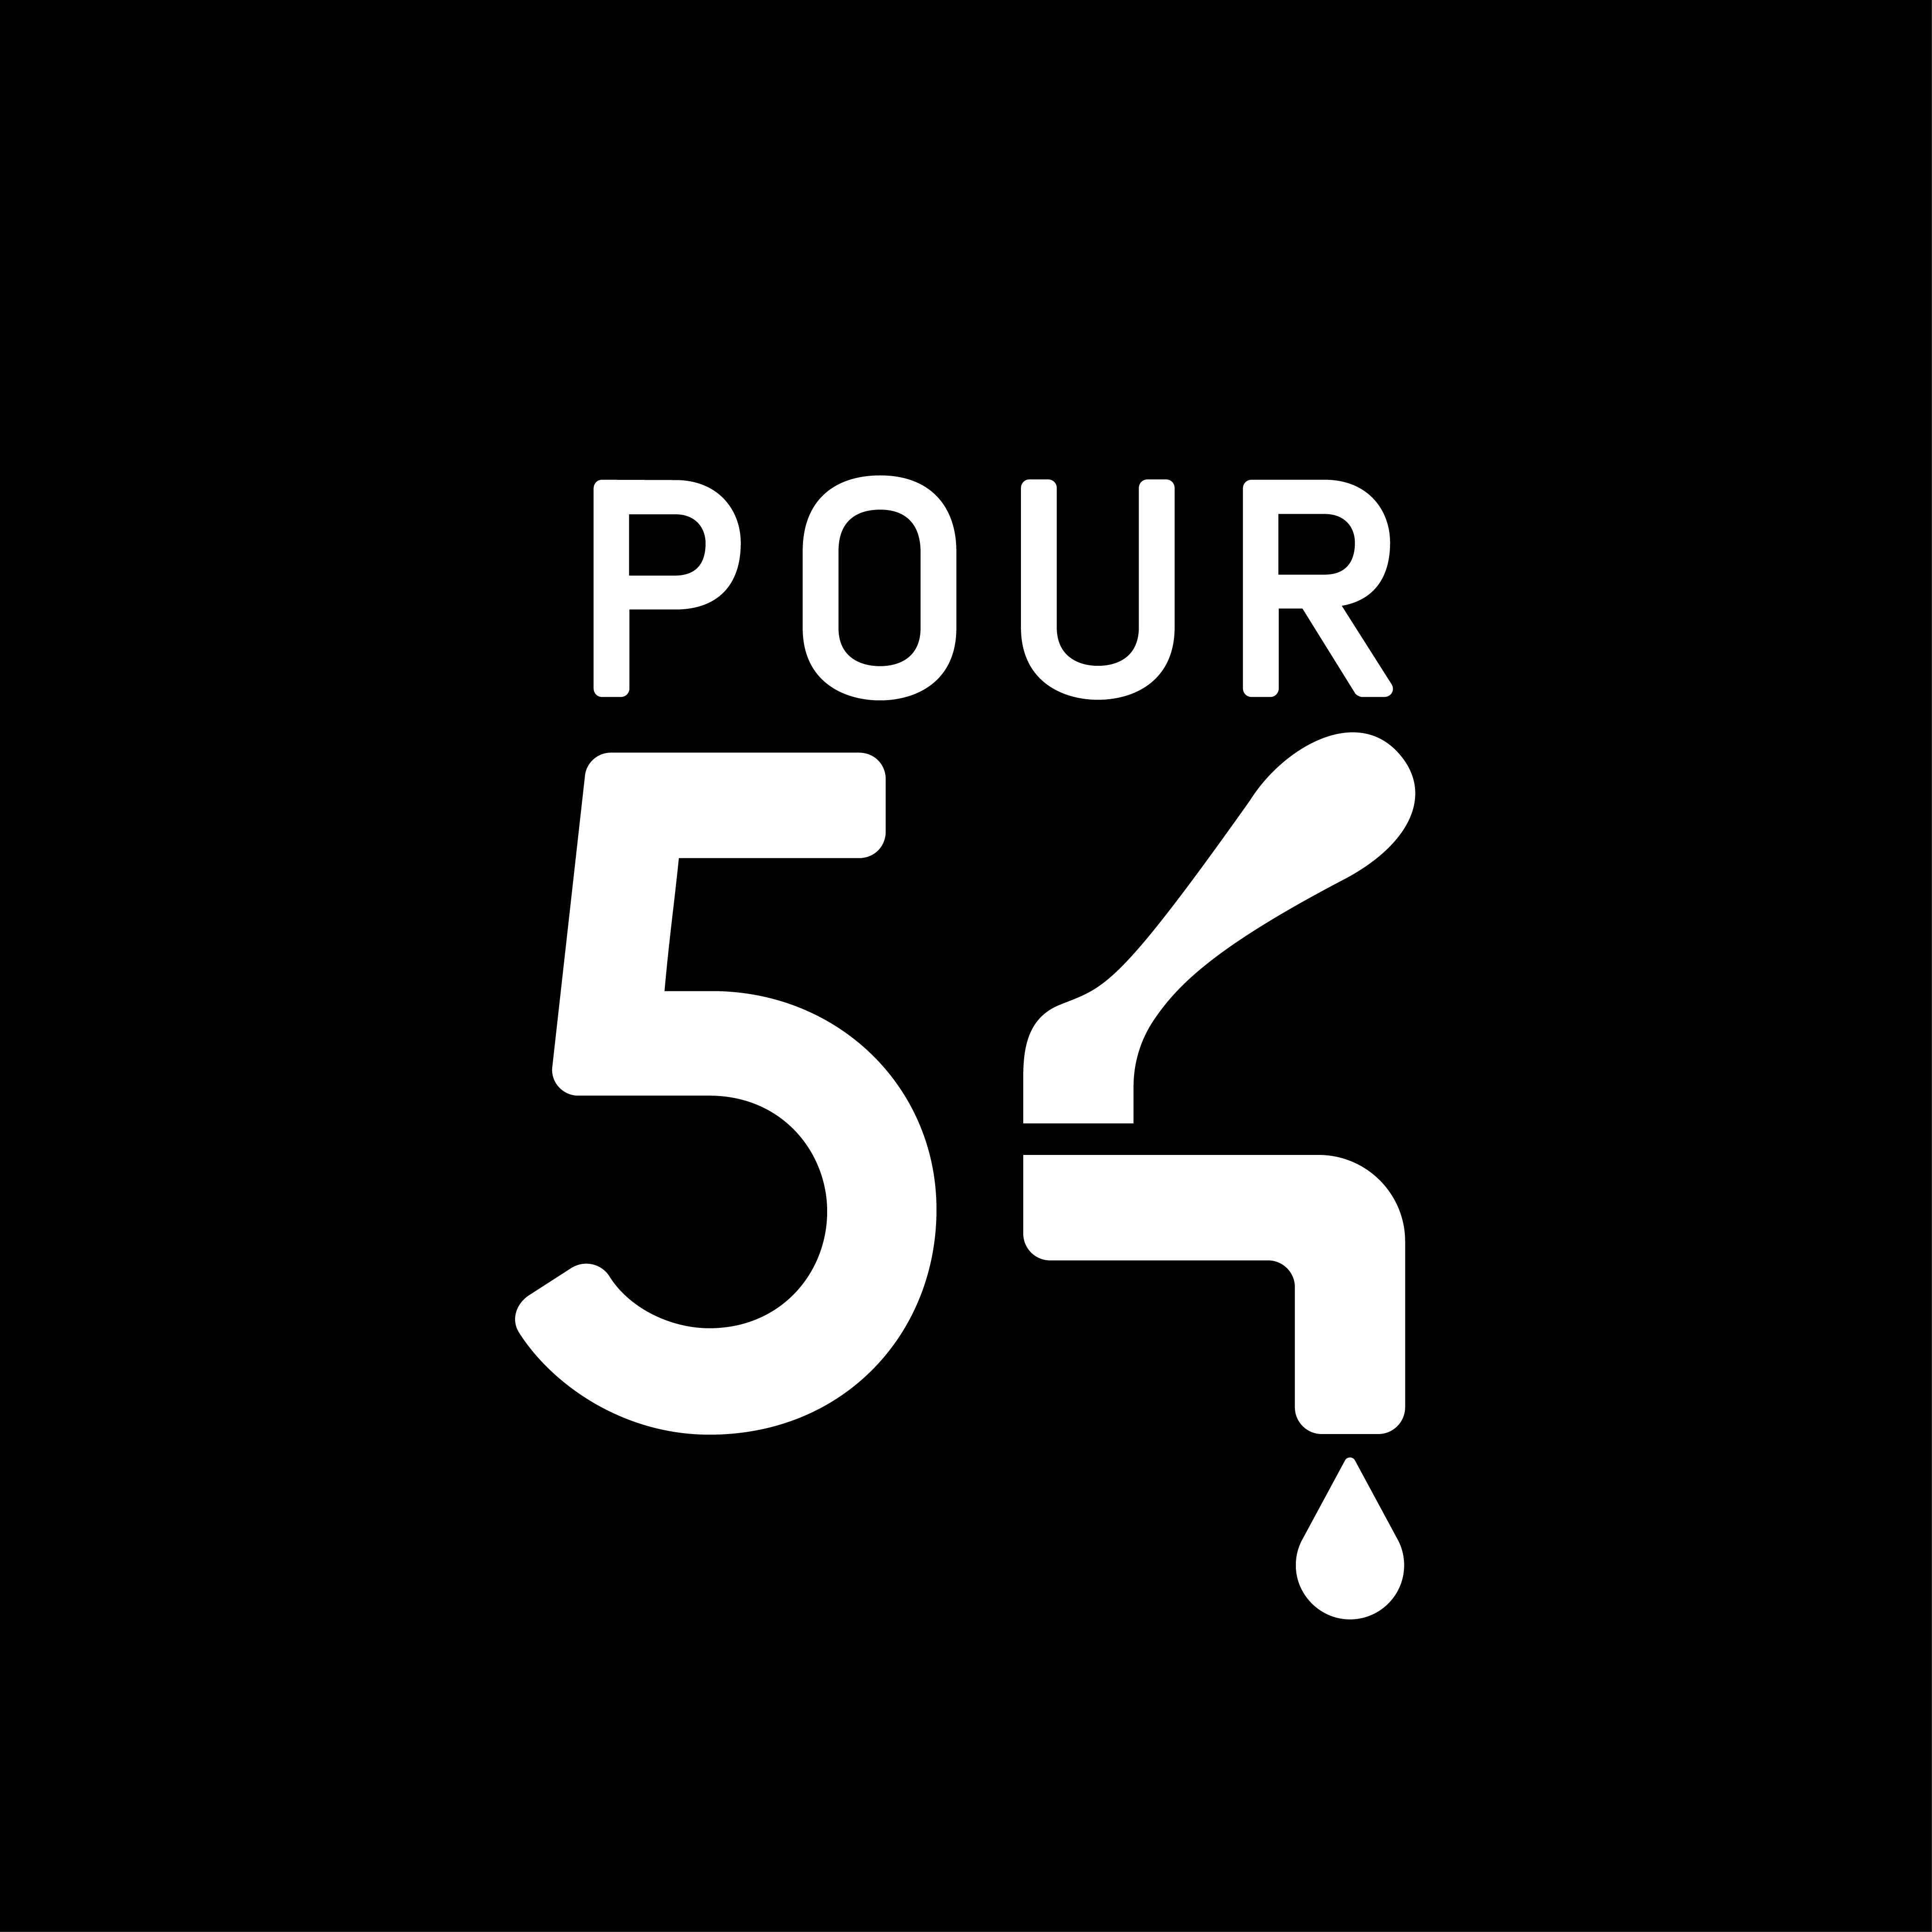 Pour54b